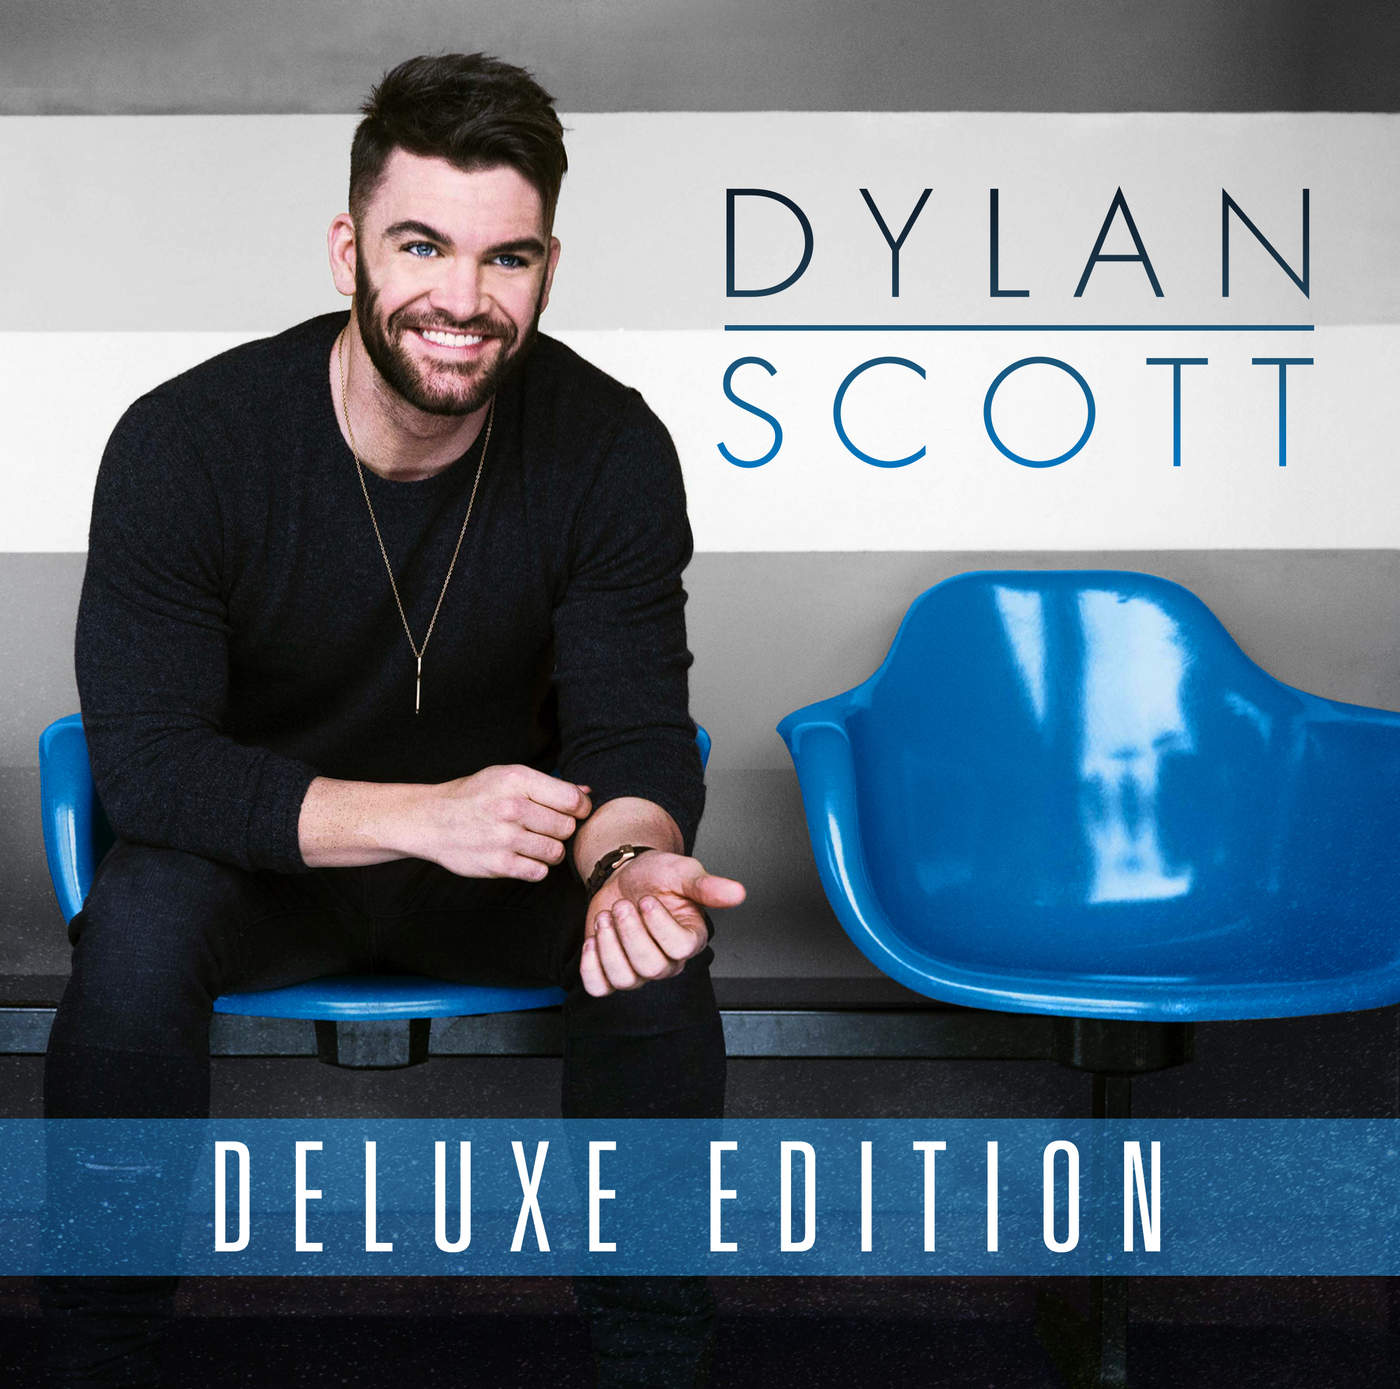 Dylan Scott - Dylan Scott (Deluxe Edition)